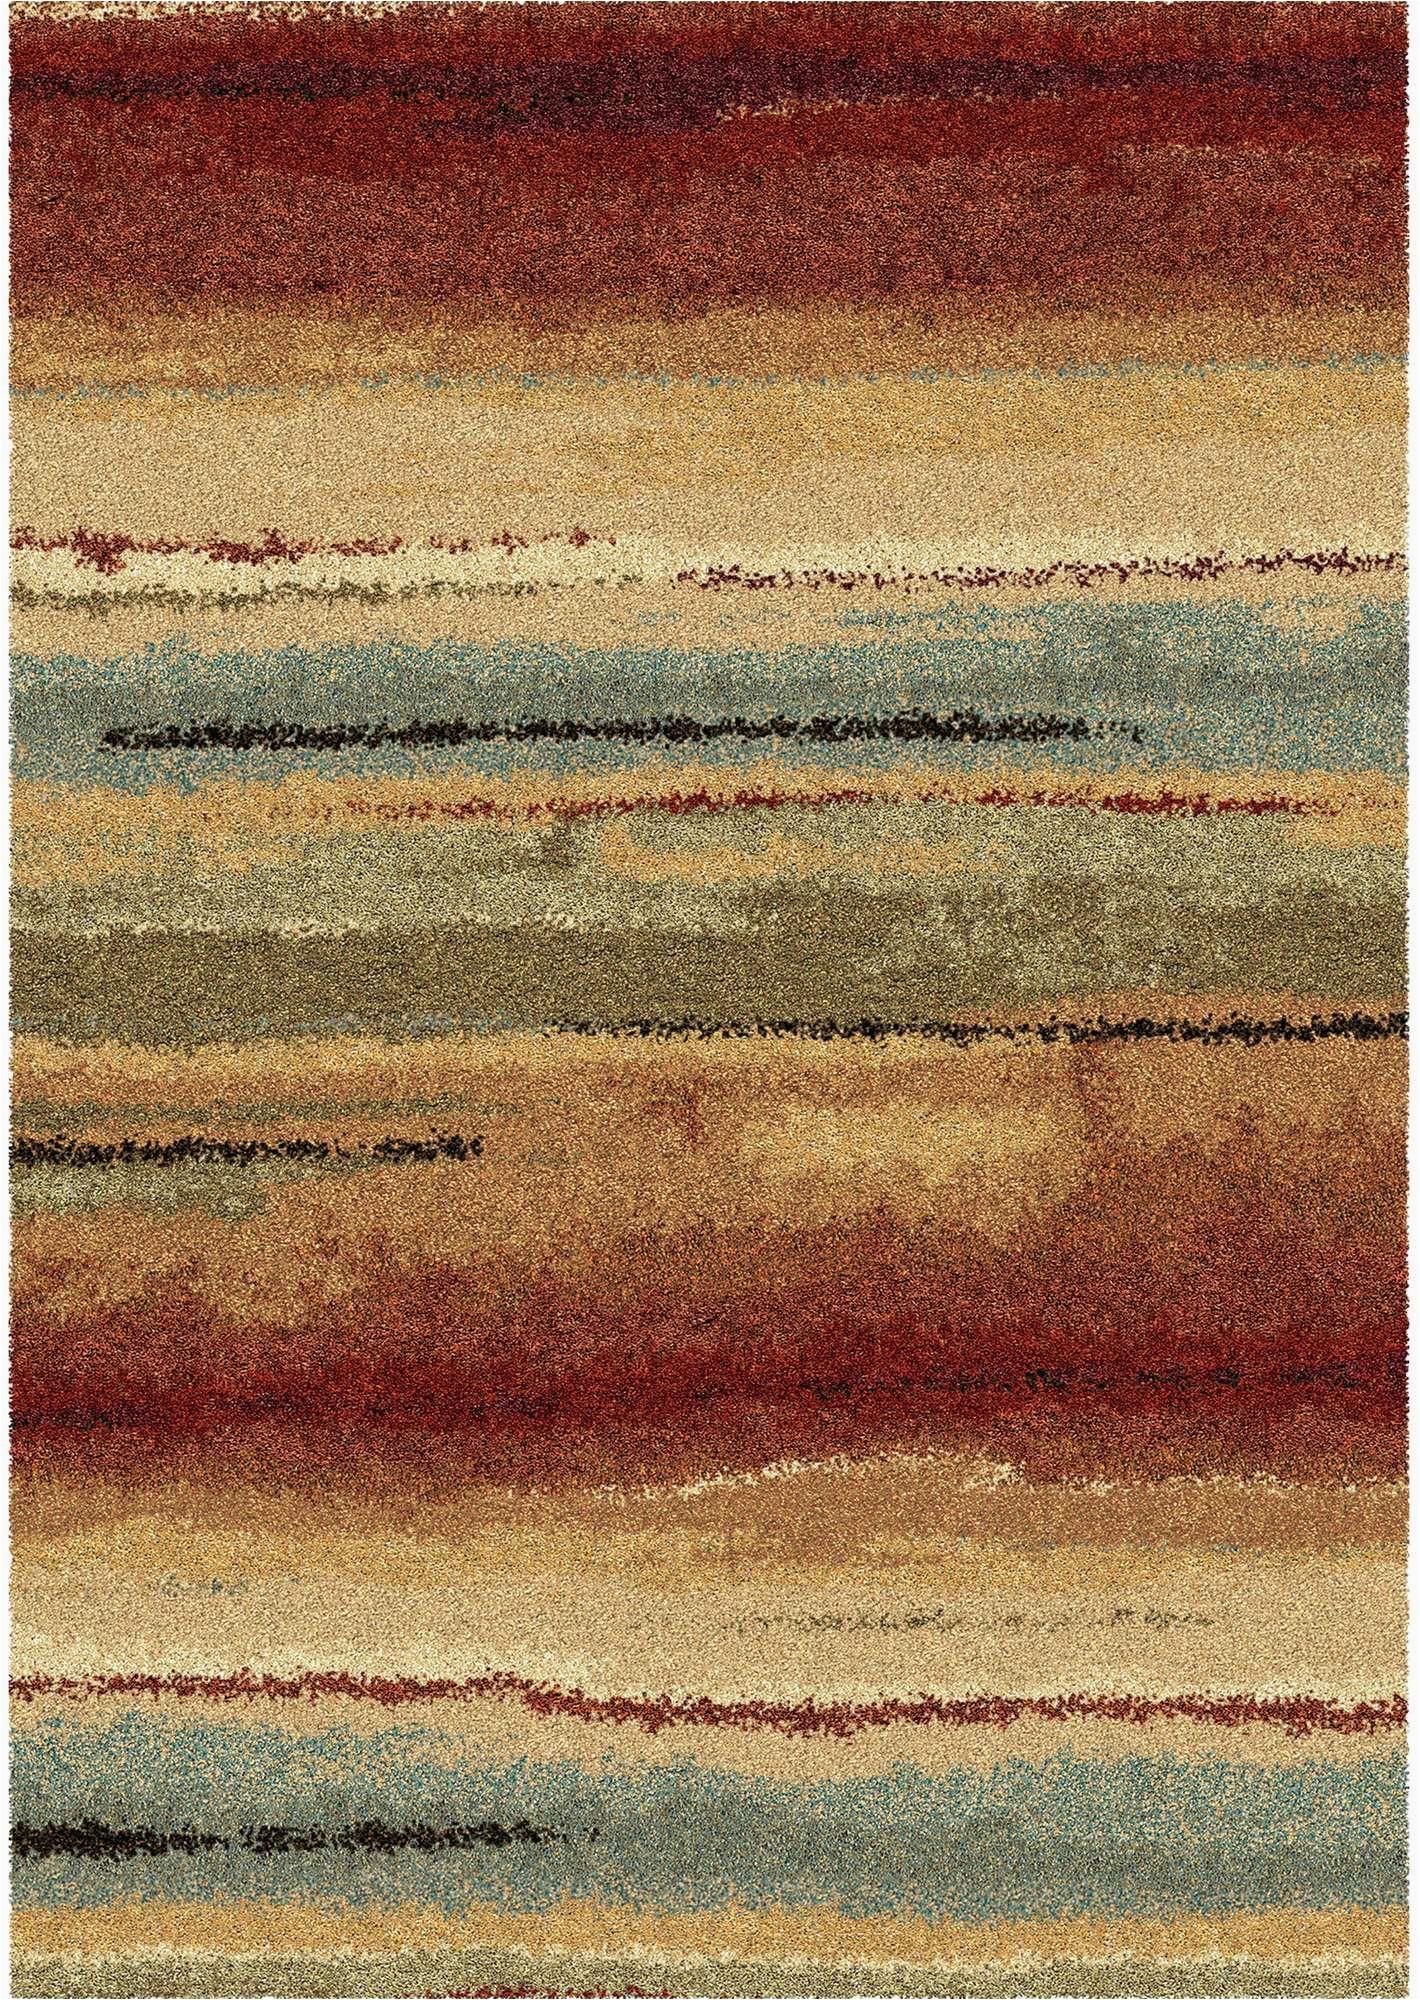 Hartle Brown Beige area Rug Our Euphoria Capizzi Multi area Rug Showcases A Beautiful